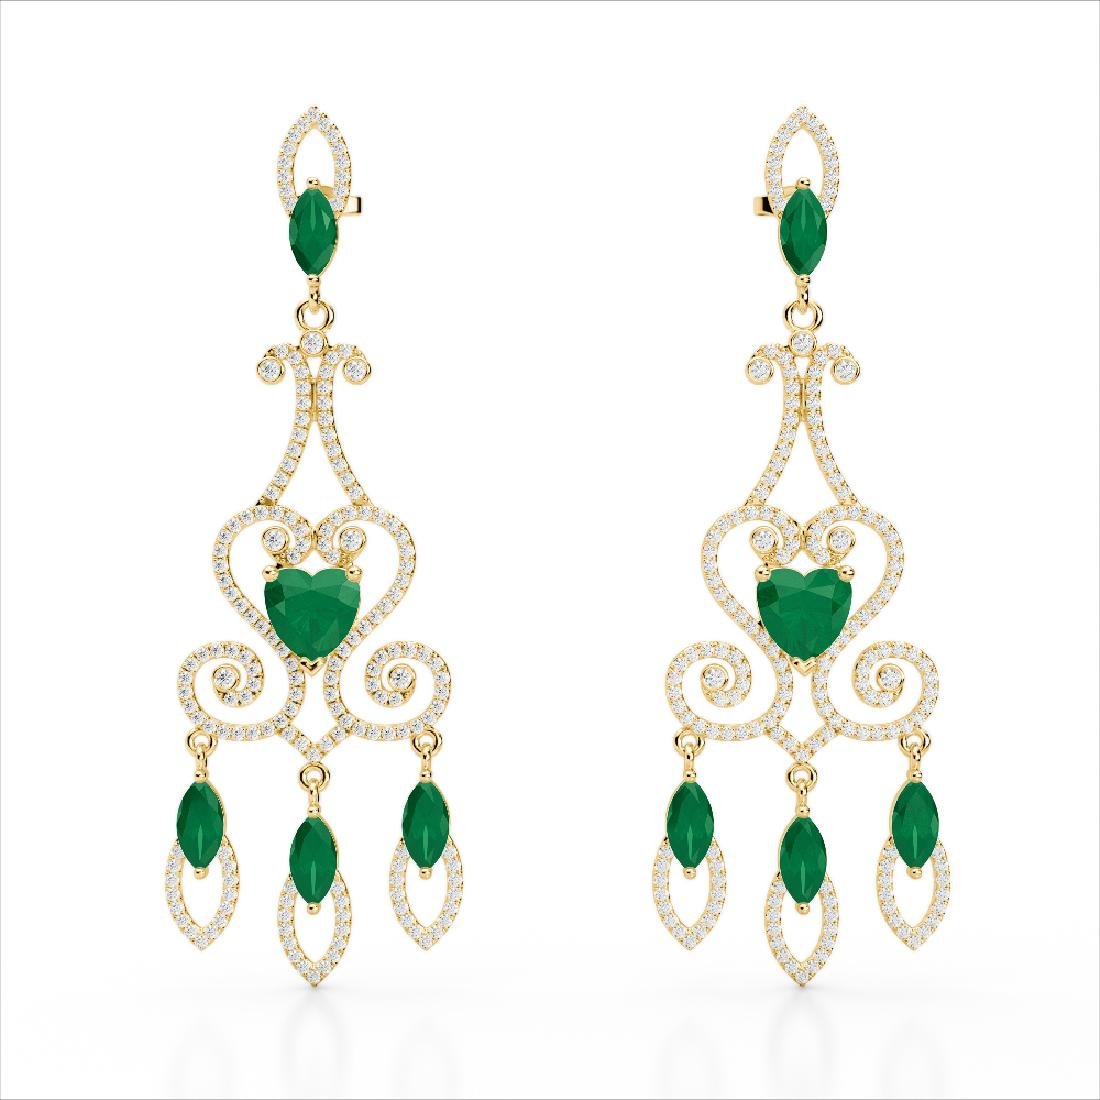 11 CTW Emerald & Micro Pave VS/SI Diamond Earrings 14K - 2